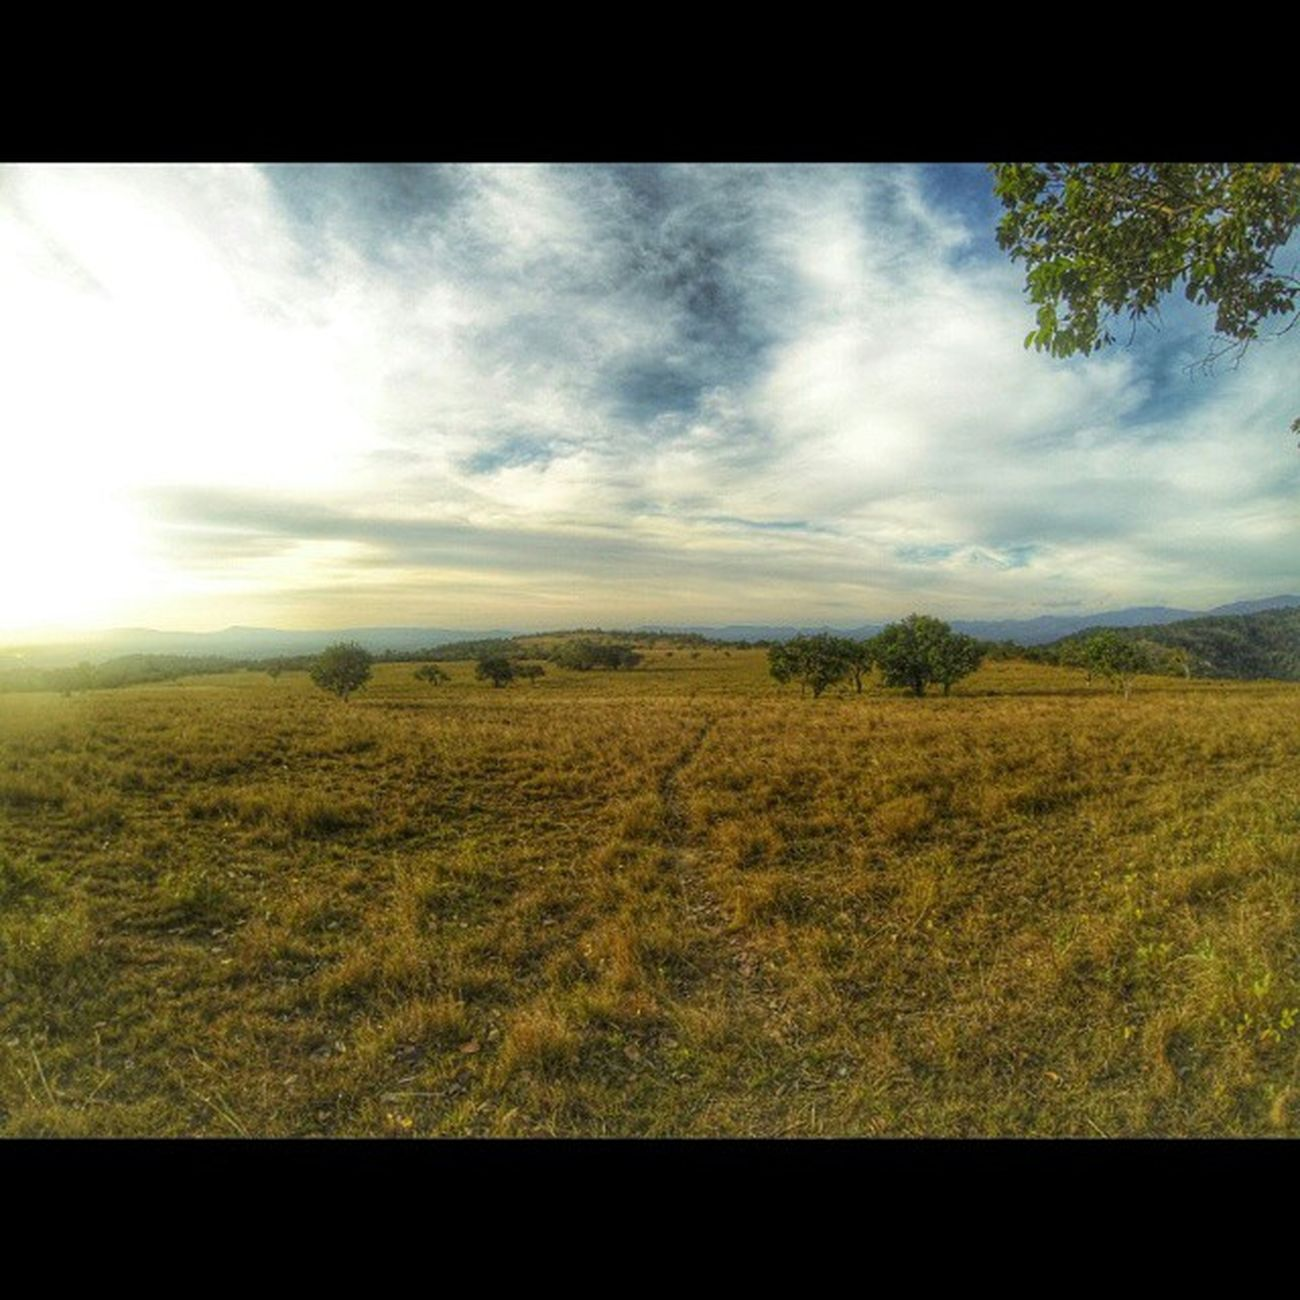 Solsona's One degree Plateau, Ilocos Norte AsankaAids AIDSventure Travelph Travel Plateau MtSicapoo Phmountains Goproph  Goprodailypics GoProHero3BE Goprotravel Itsmorefuninthephilippines Itravel